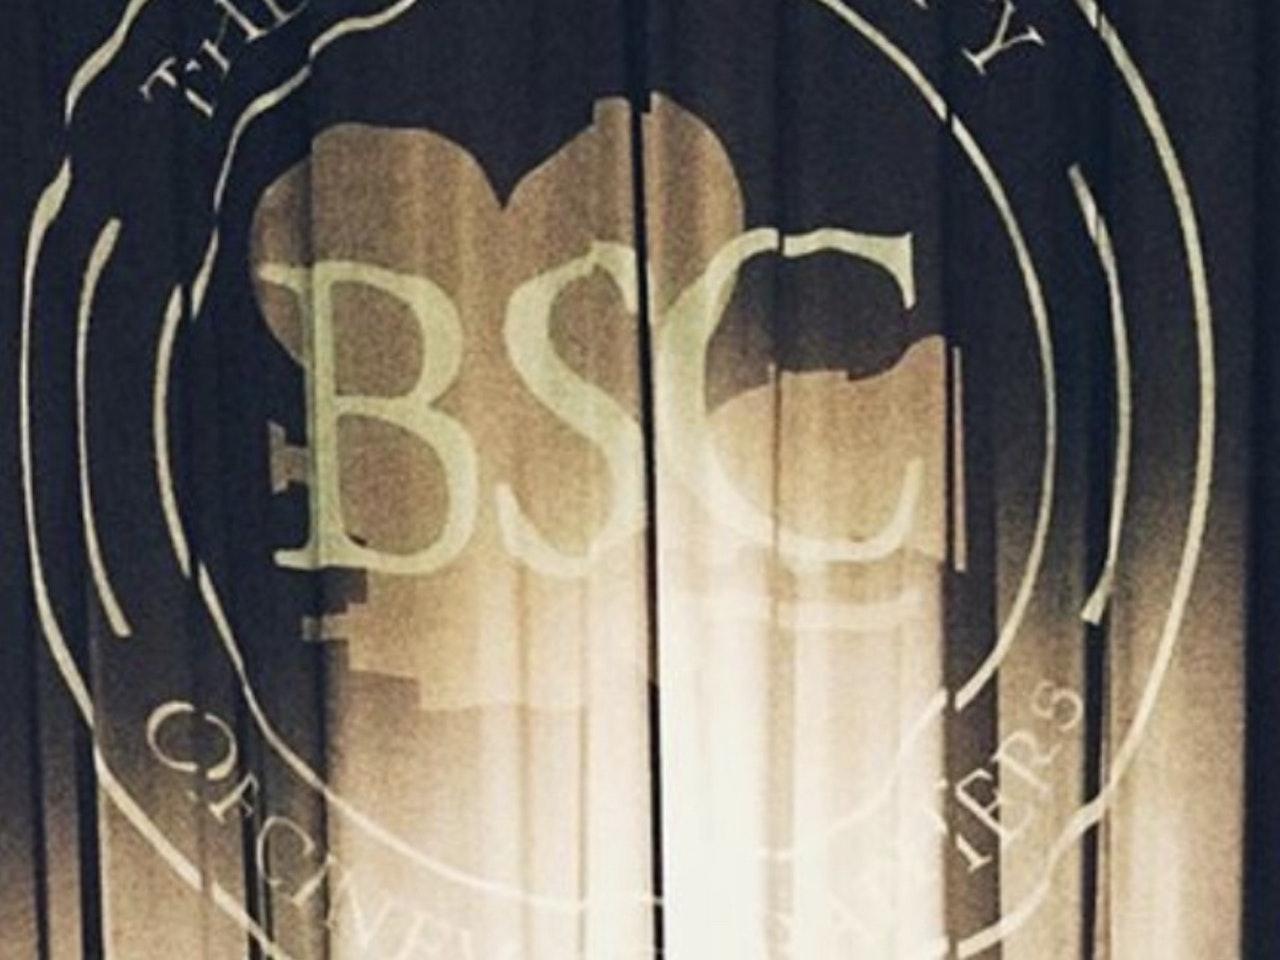 BSC Emerging Cinematographer Award Nomination